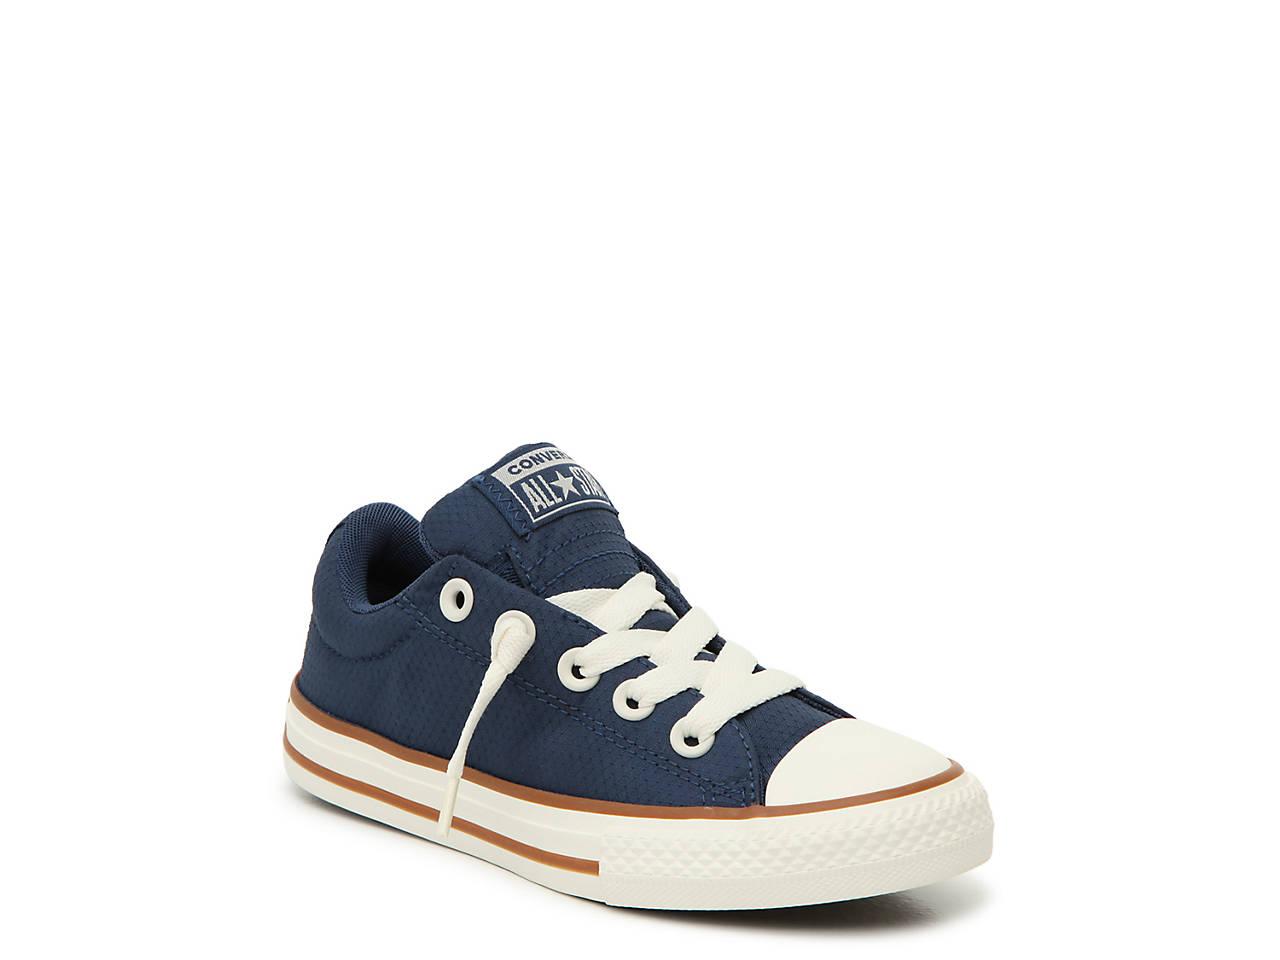 42c0b969a1a Converse Chuck Taylor All Star Street Pinstripe Toddler & Youth Slip ...